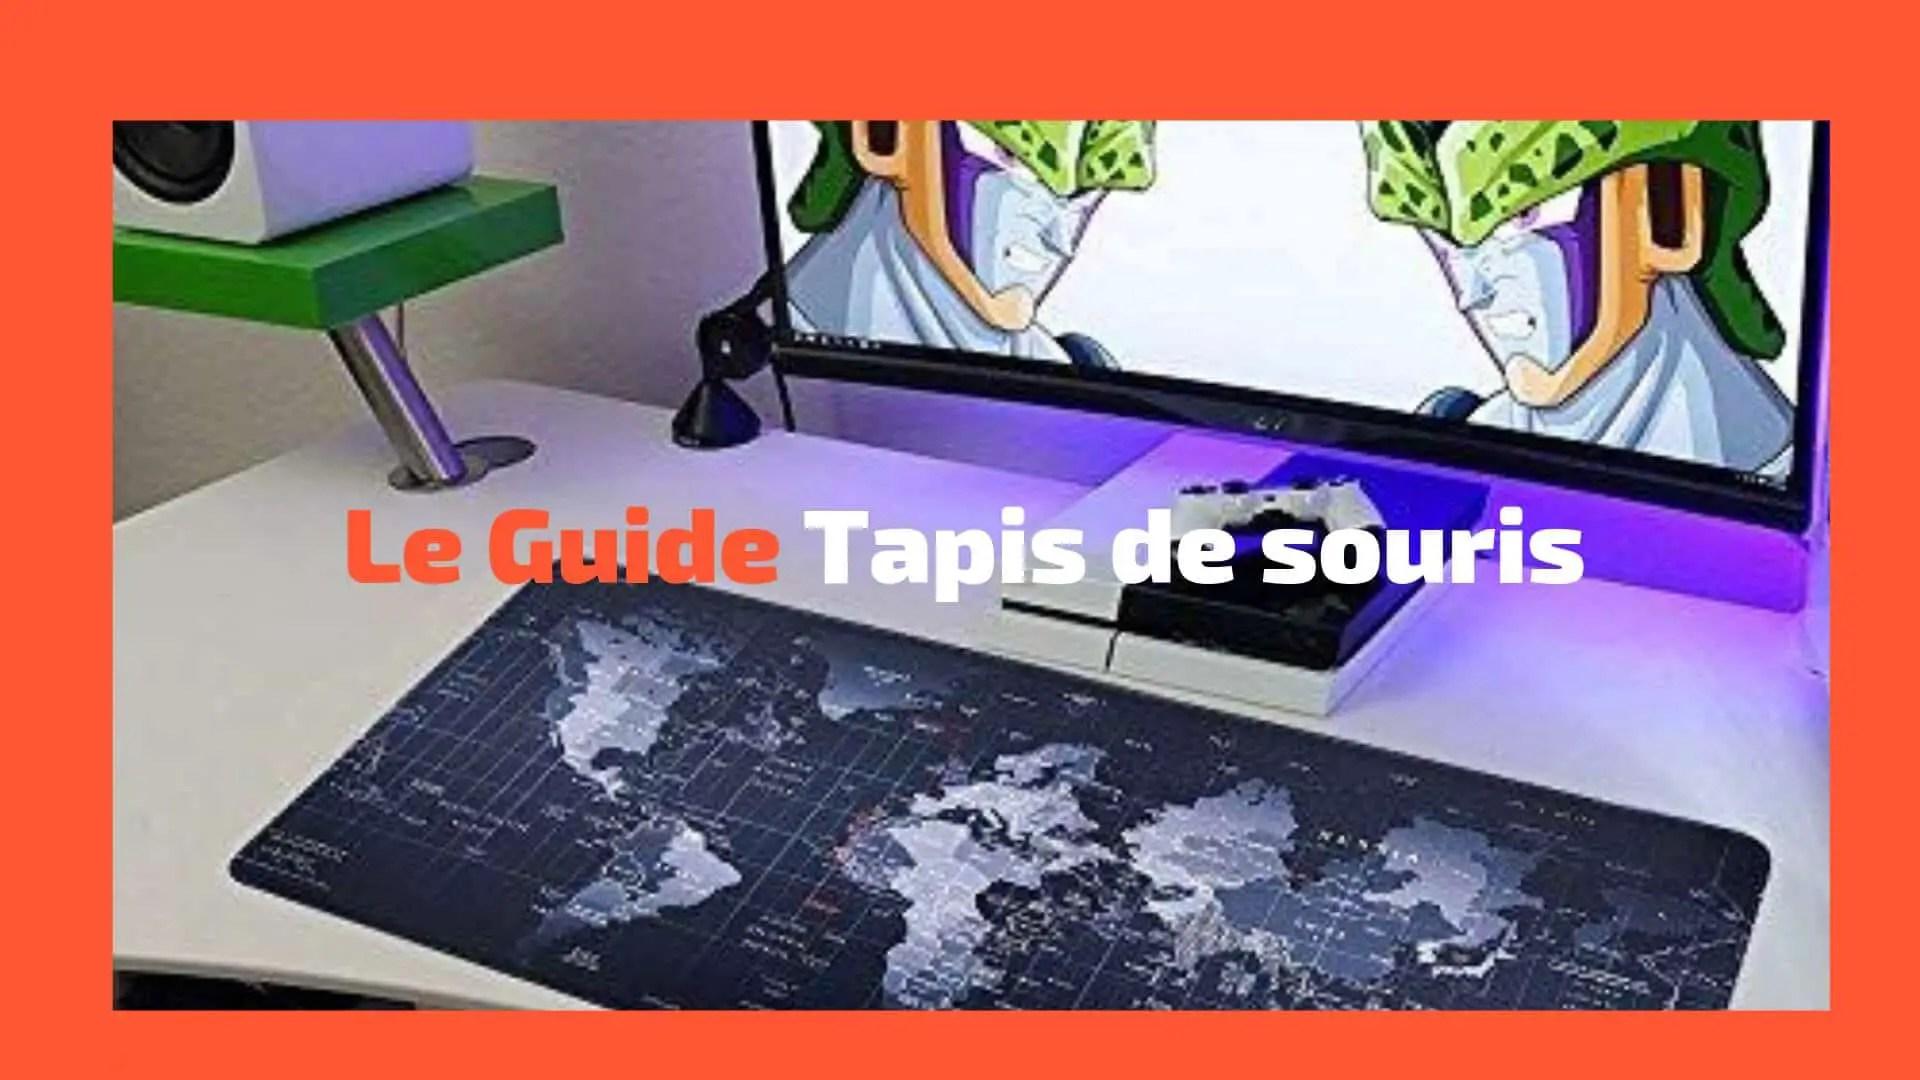 Guide meilleurs tapis de souris gamer 2019